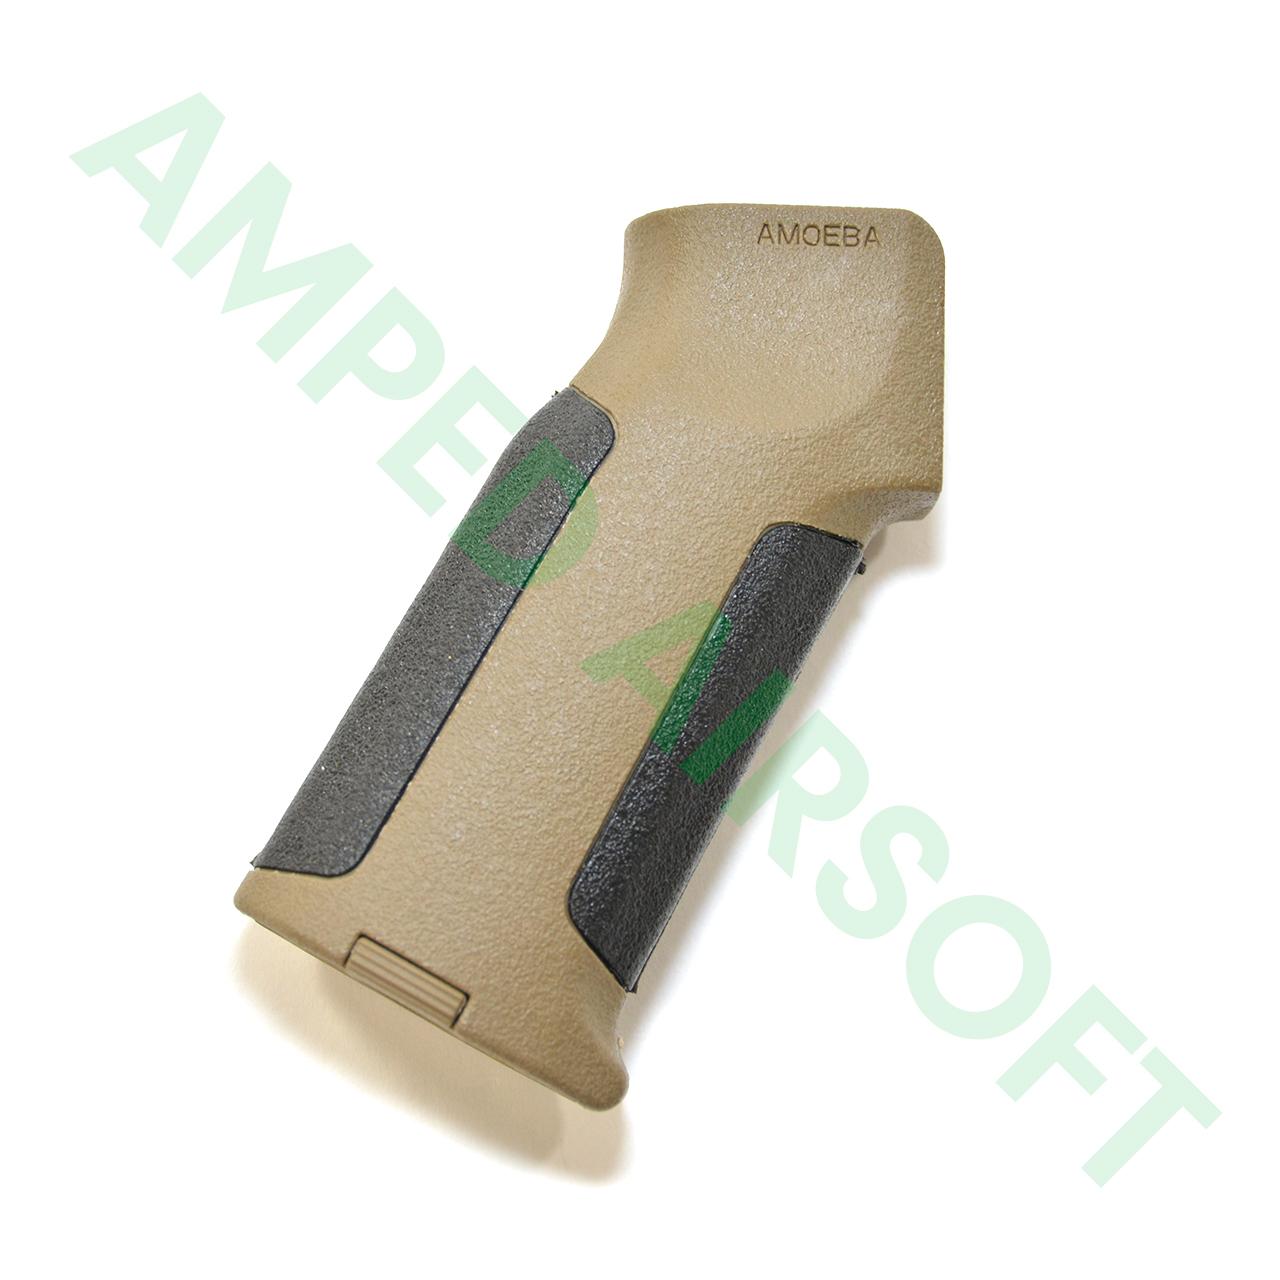 Amoeba - Pro Beavertail Straight Backstrap M4 Grip (Black/Dark Earth)